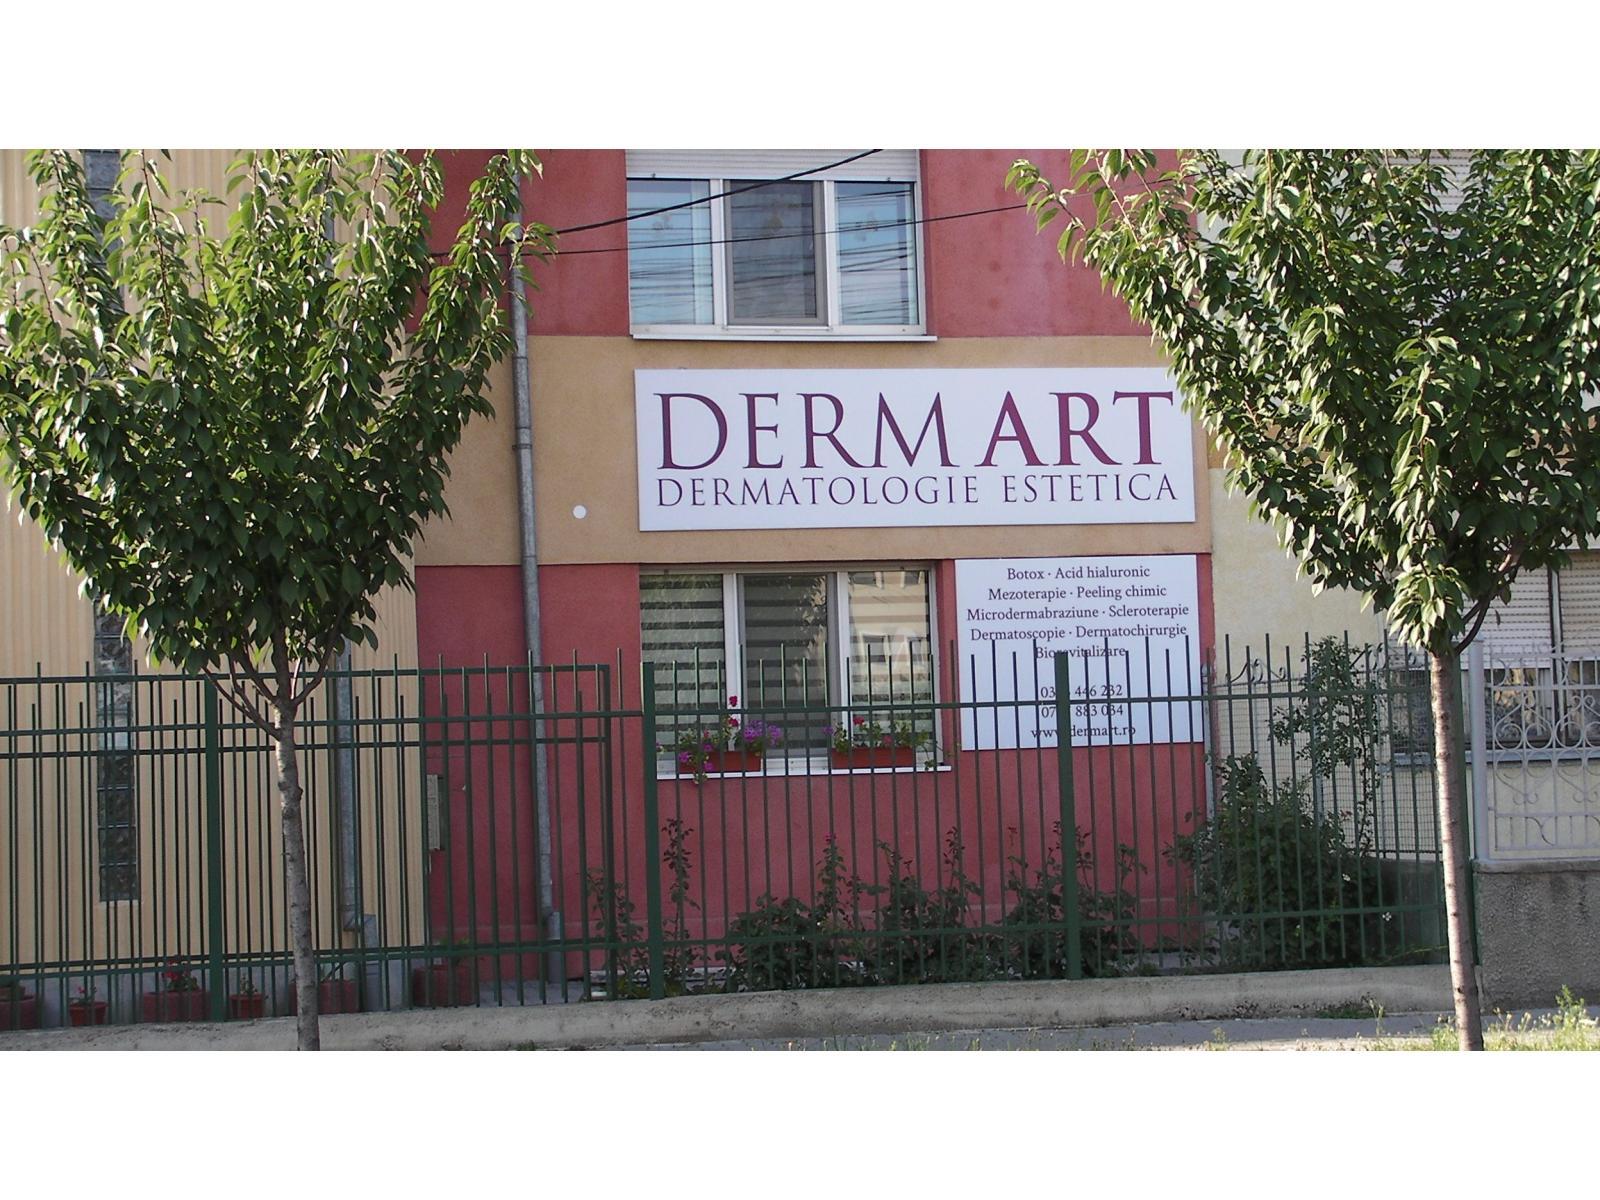 DERMART cabinet medical de dermatologie estetica - SANY0181.JPG